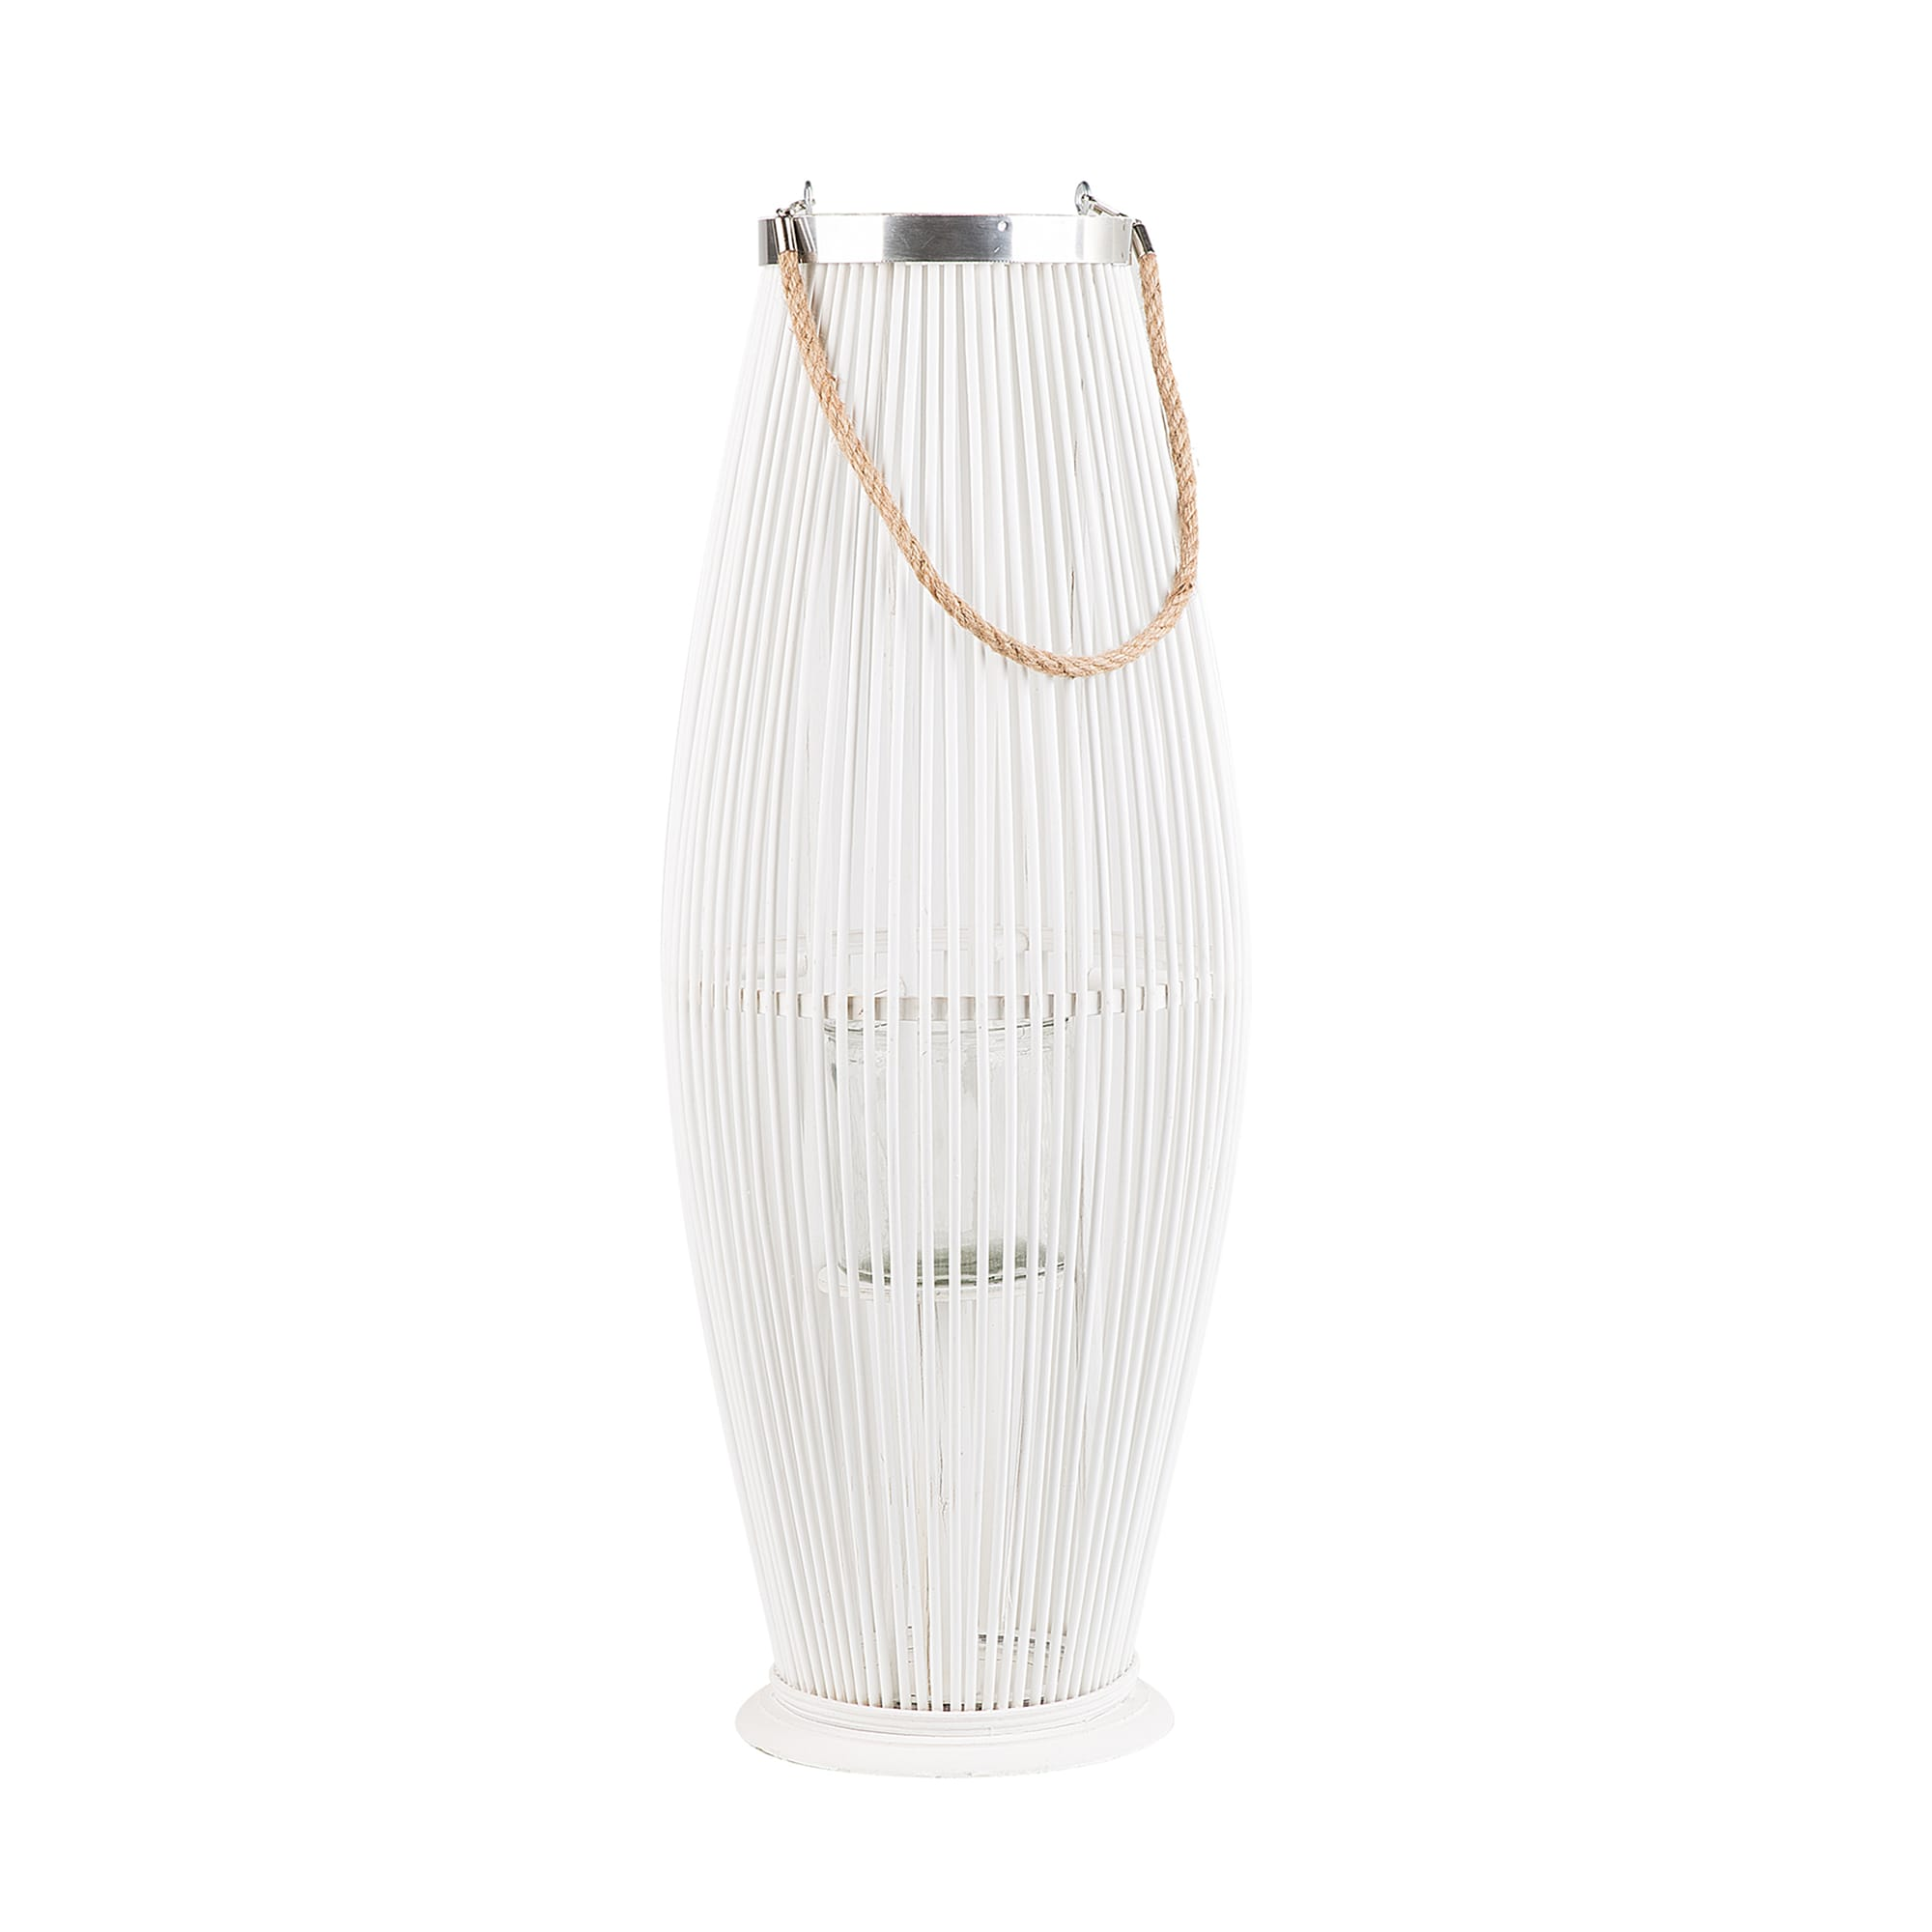 Lanterne blanche 72 cm